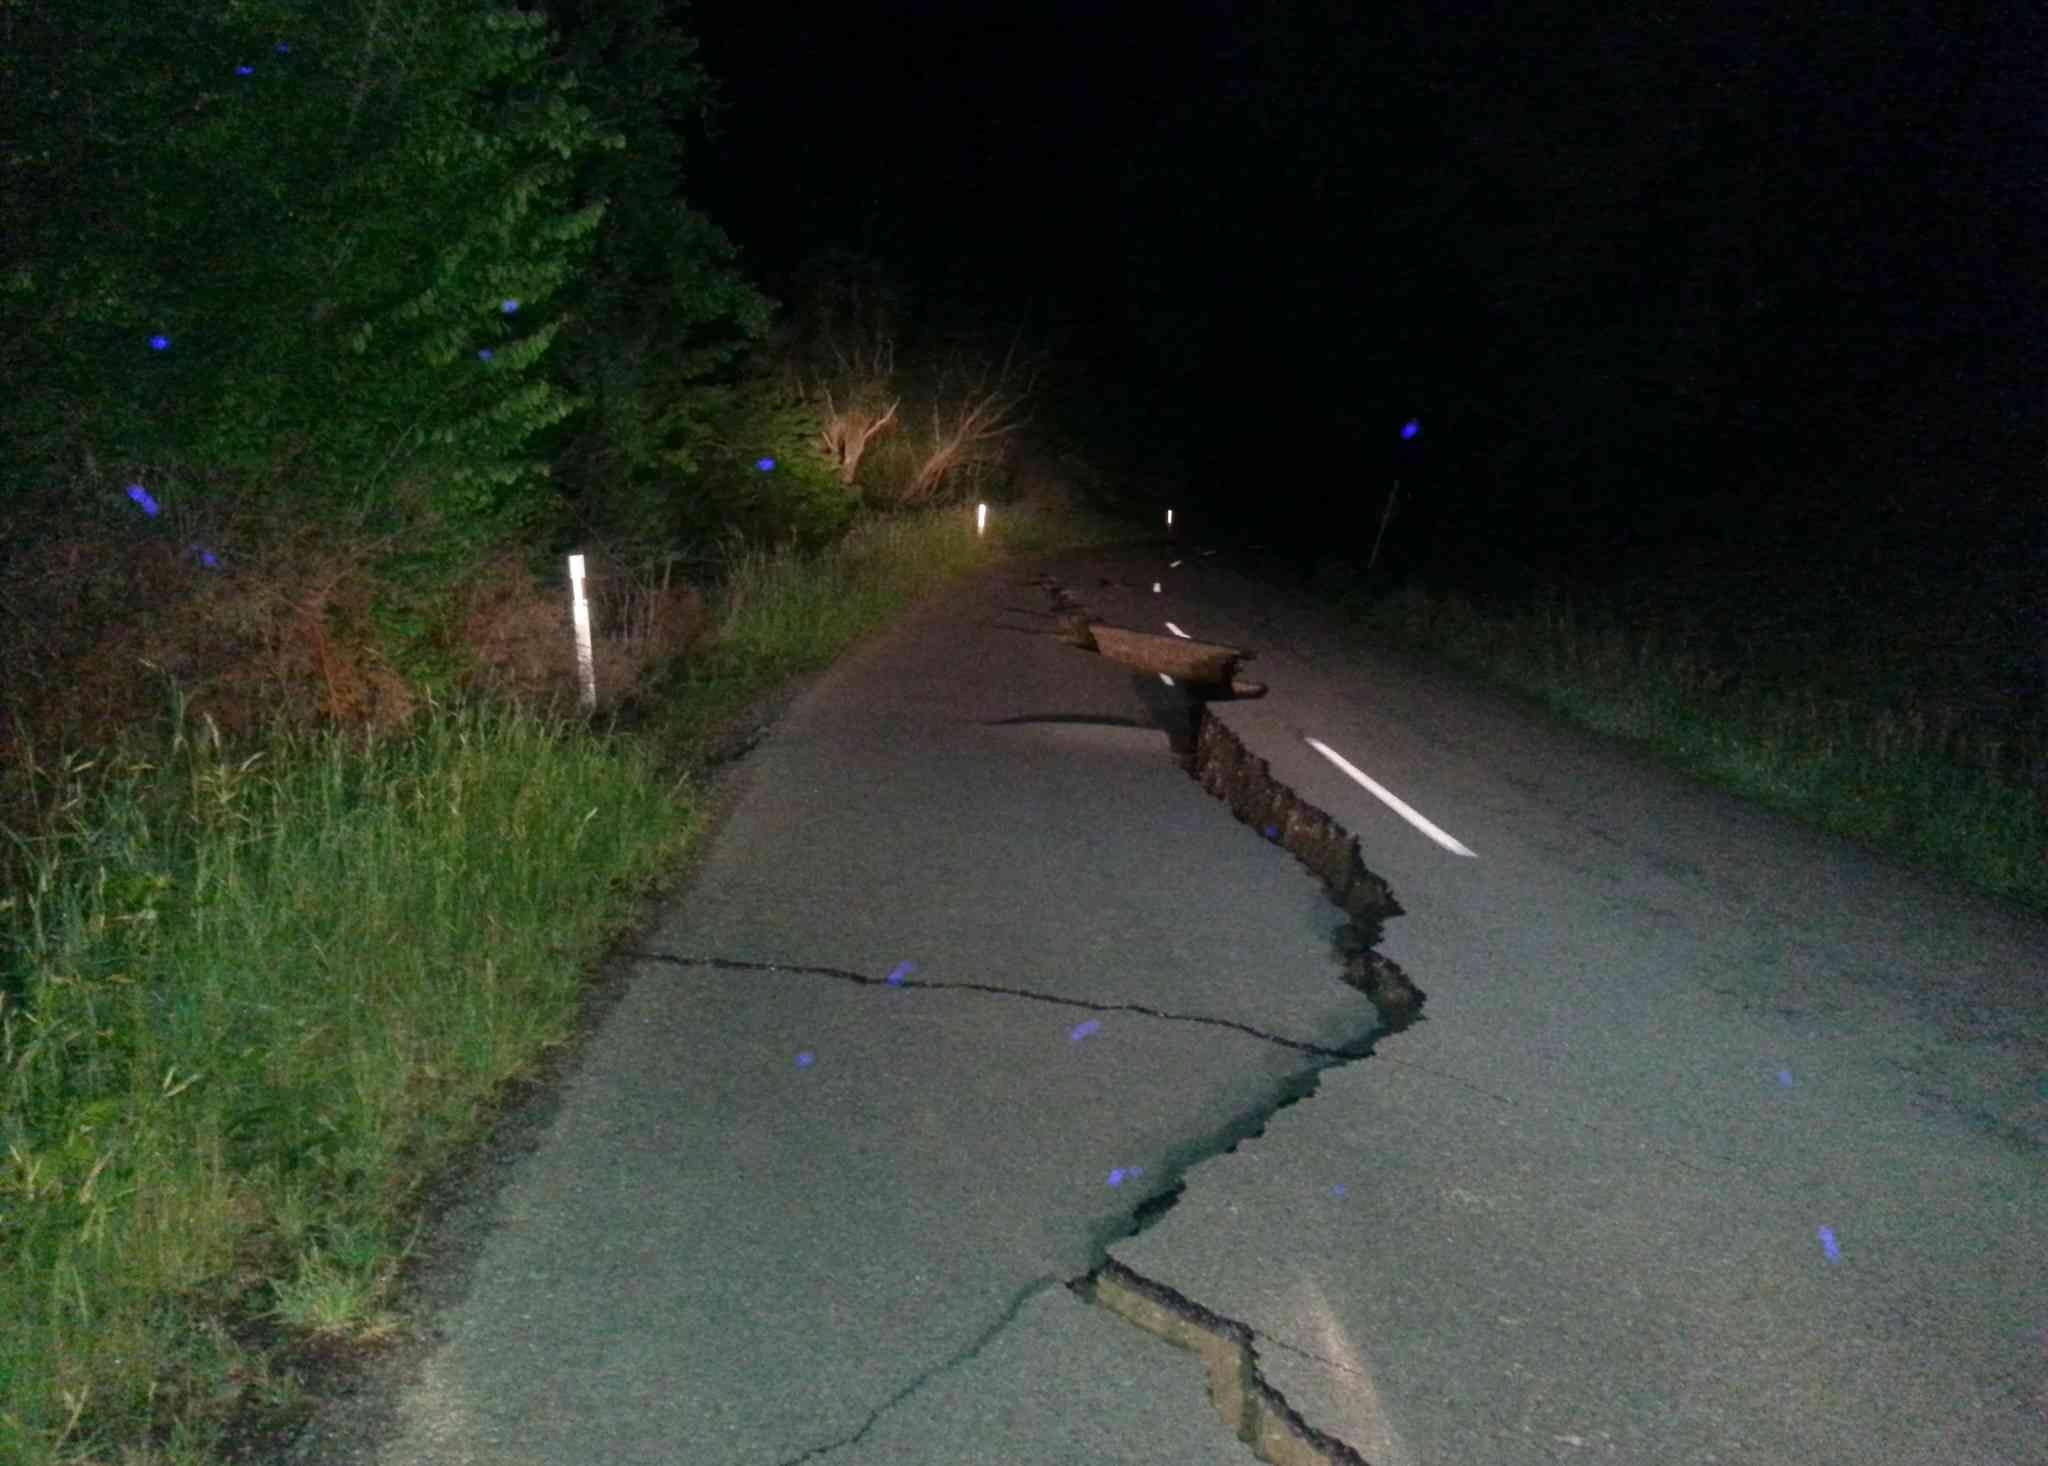 nueva_zelanda_sismo_eg-a20b-jpg_388607221